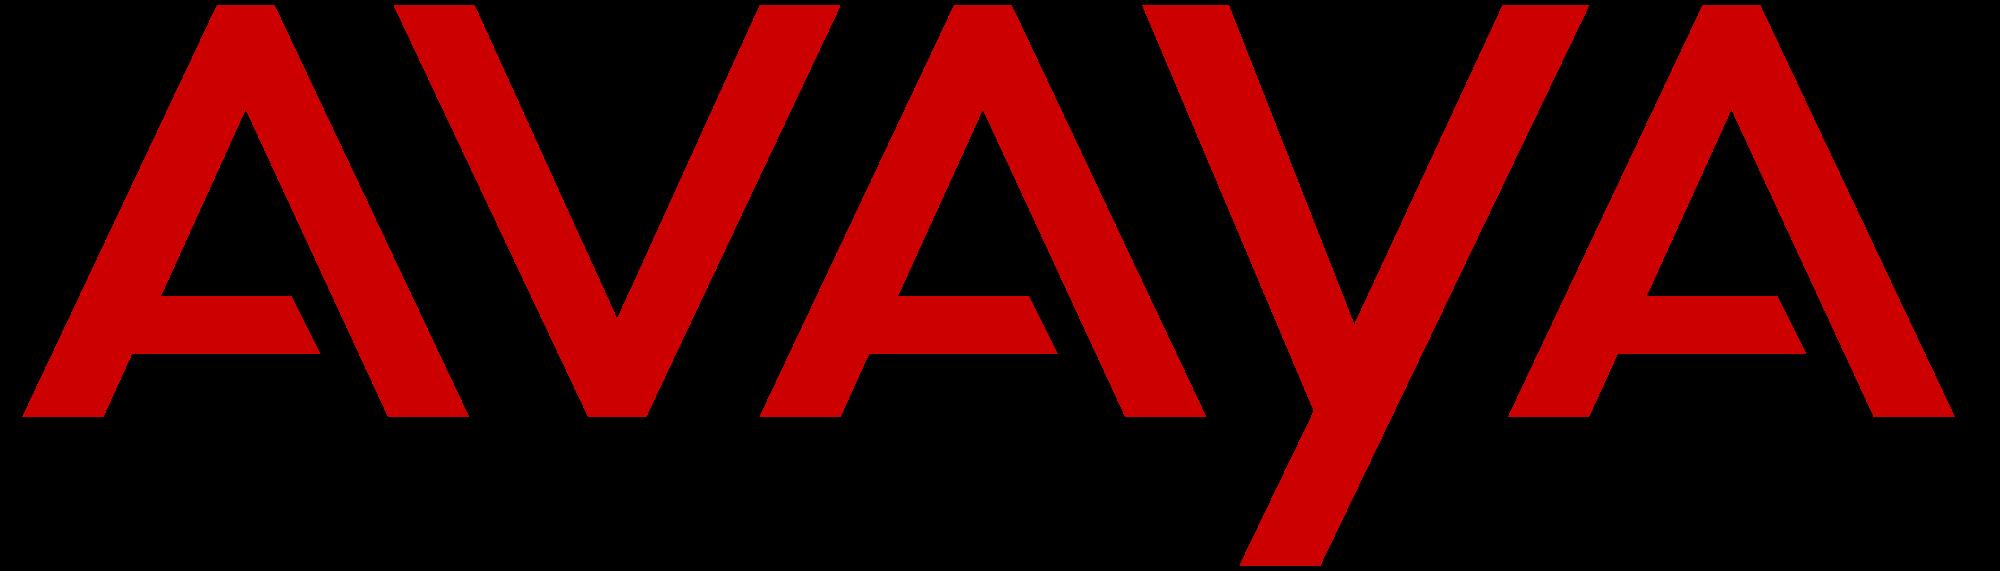 Avaya-T.png